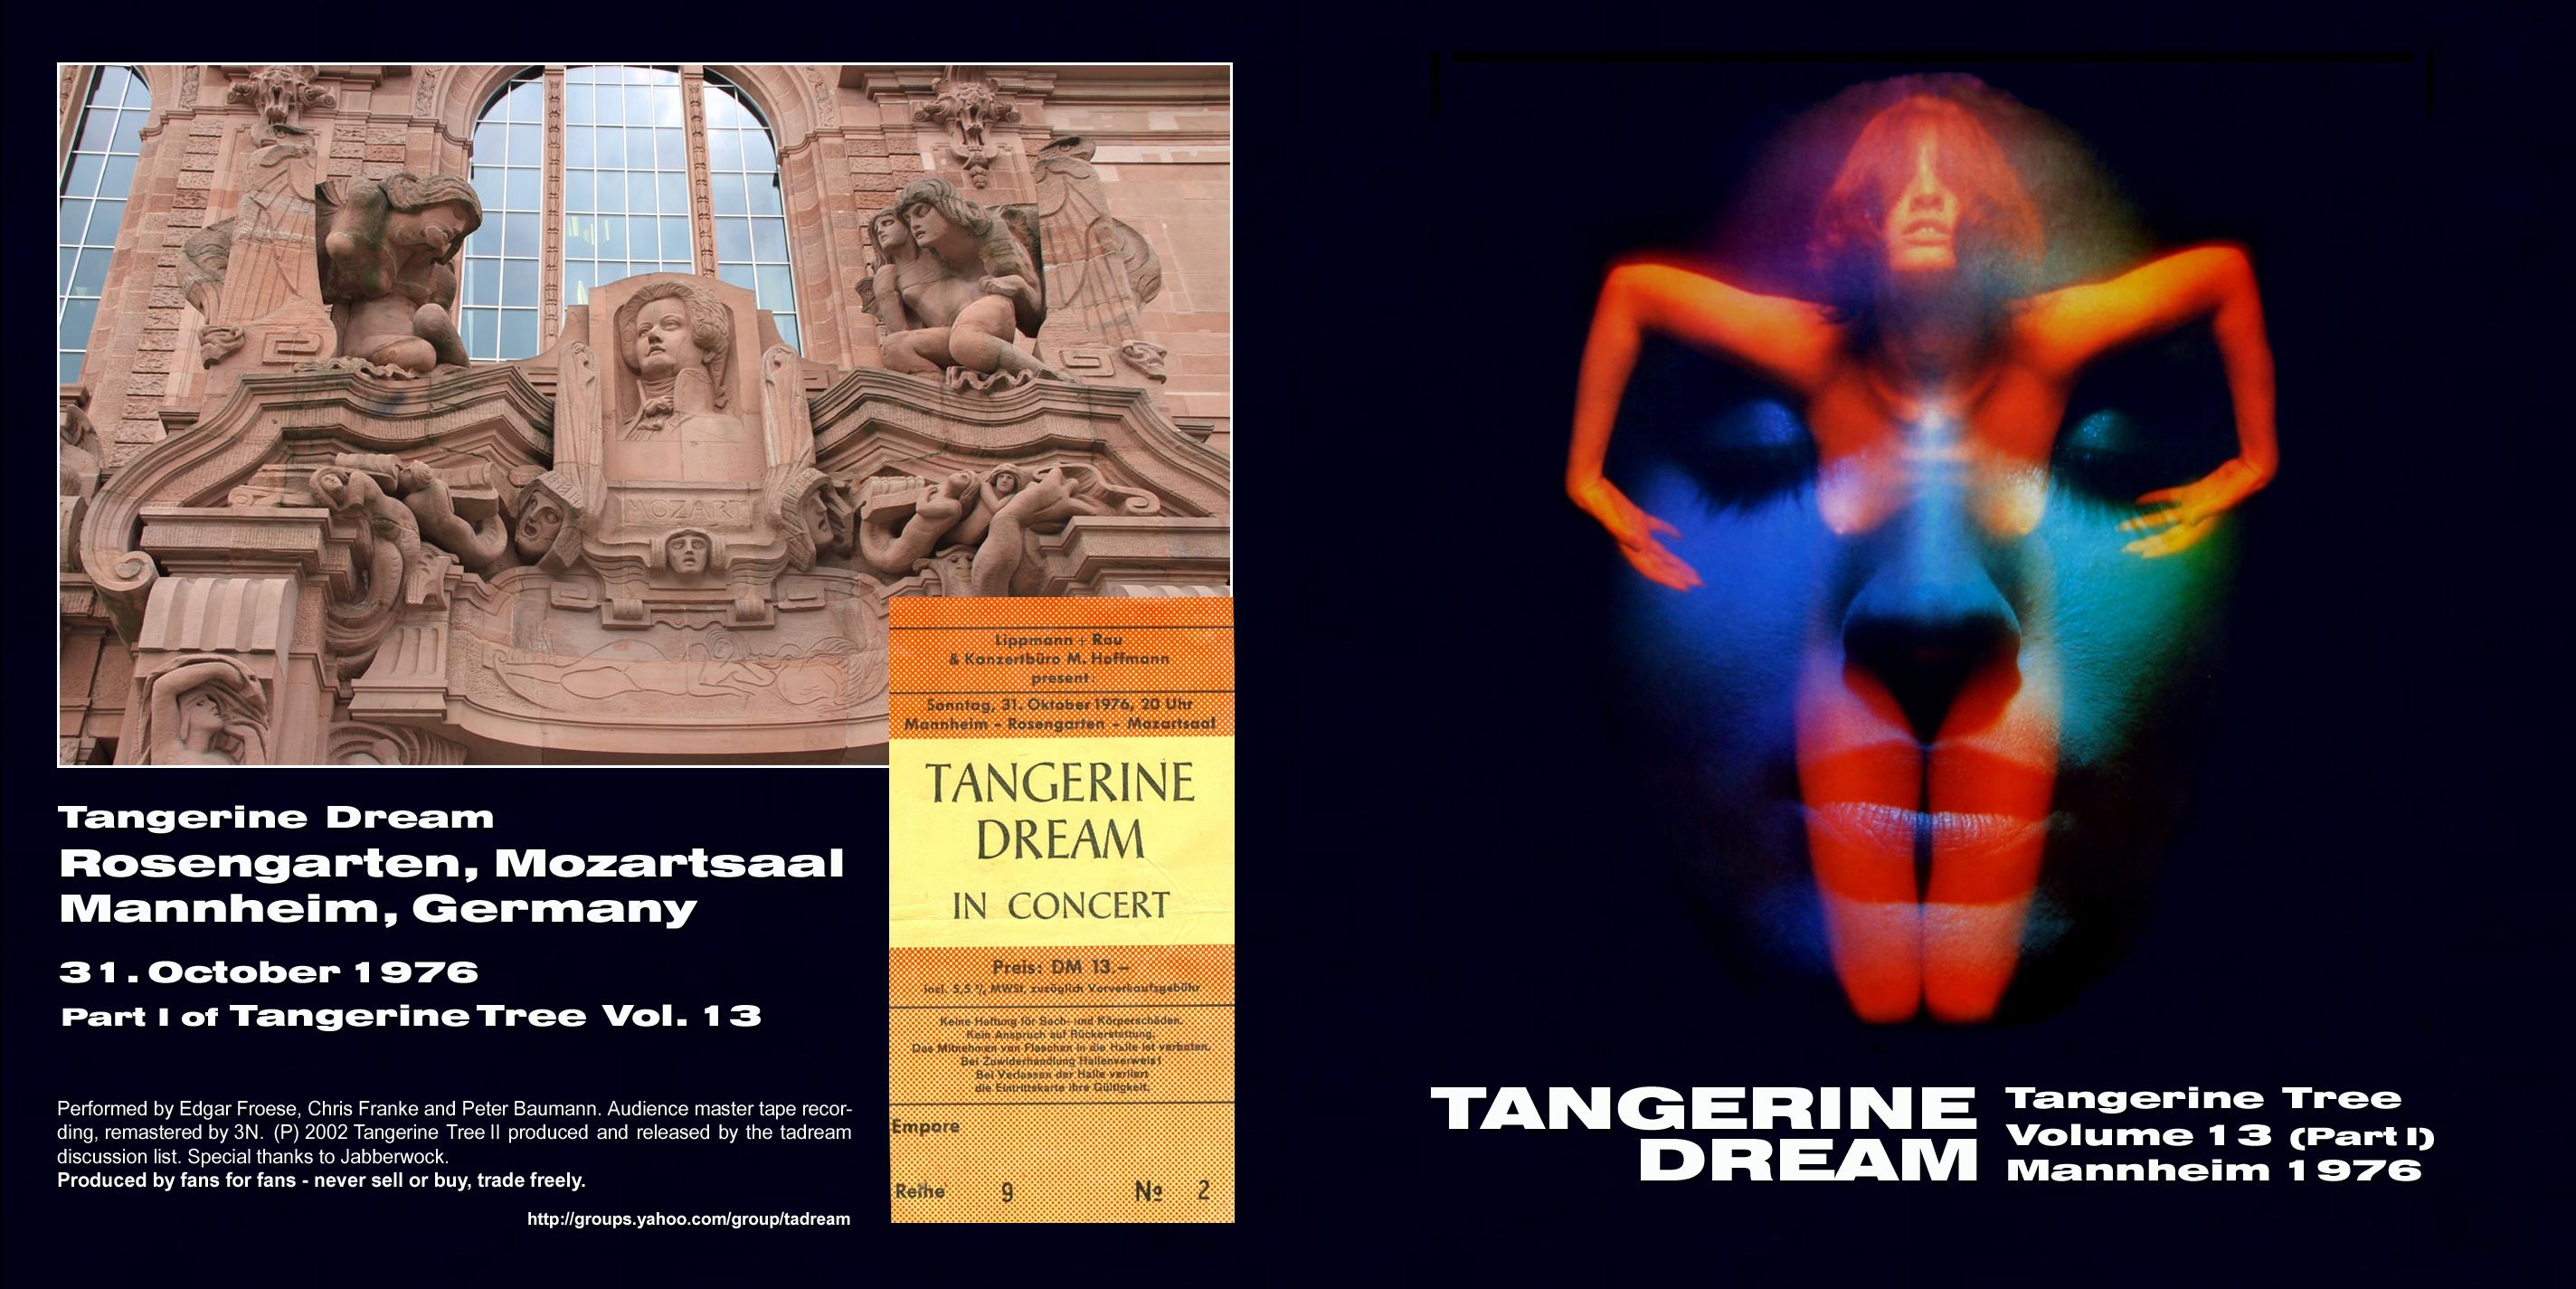 TangerineDream1976-10-31MannheimMozartSaalGermany.jpg